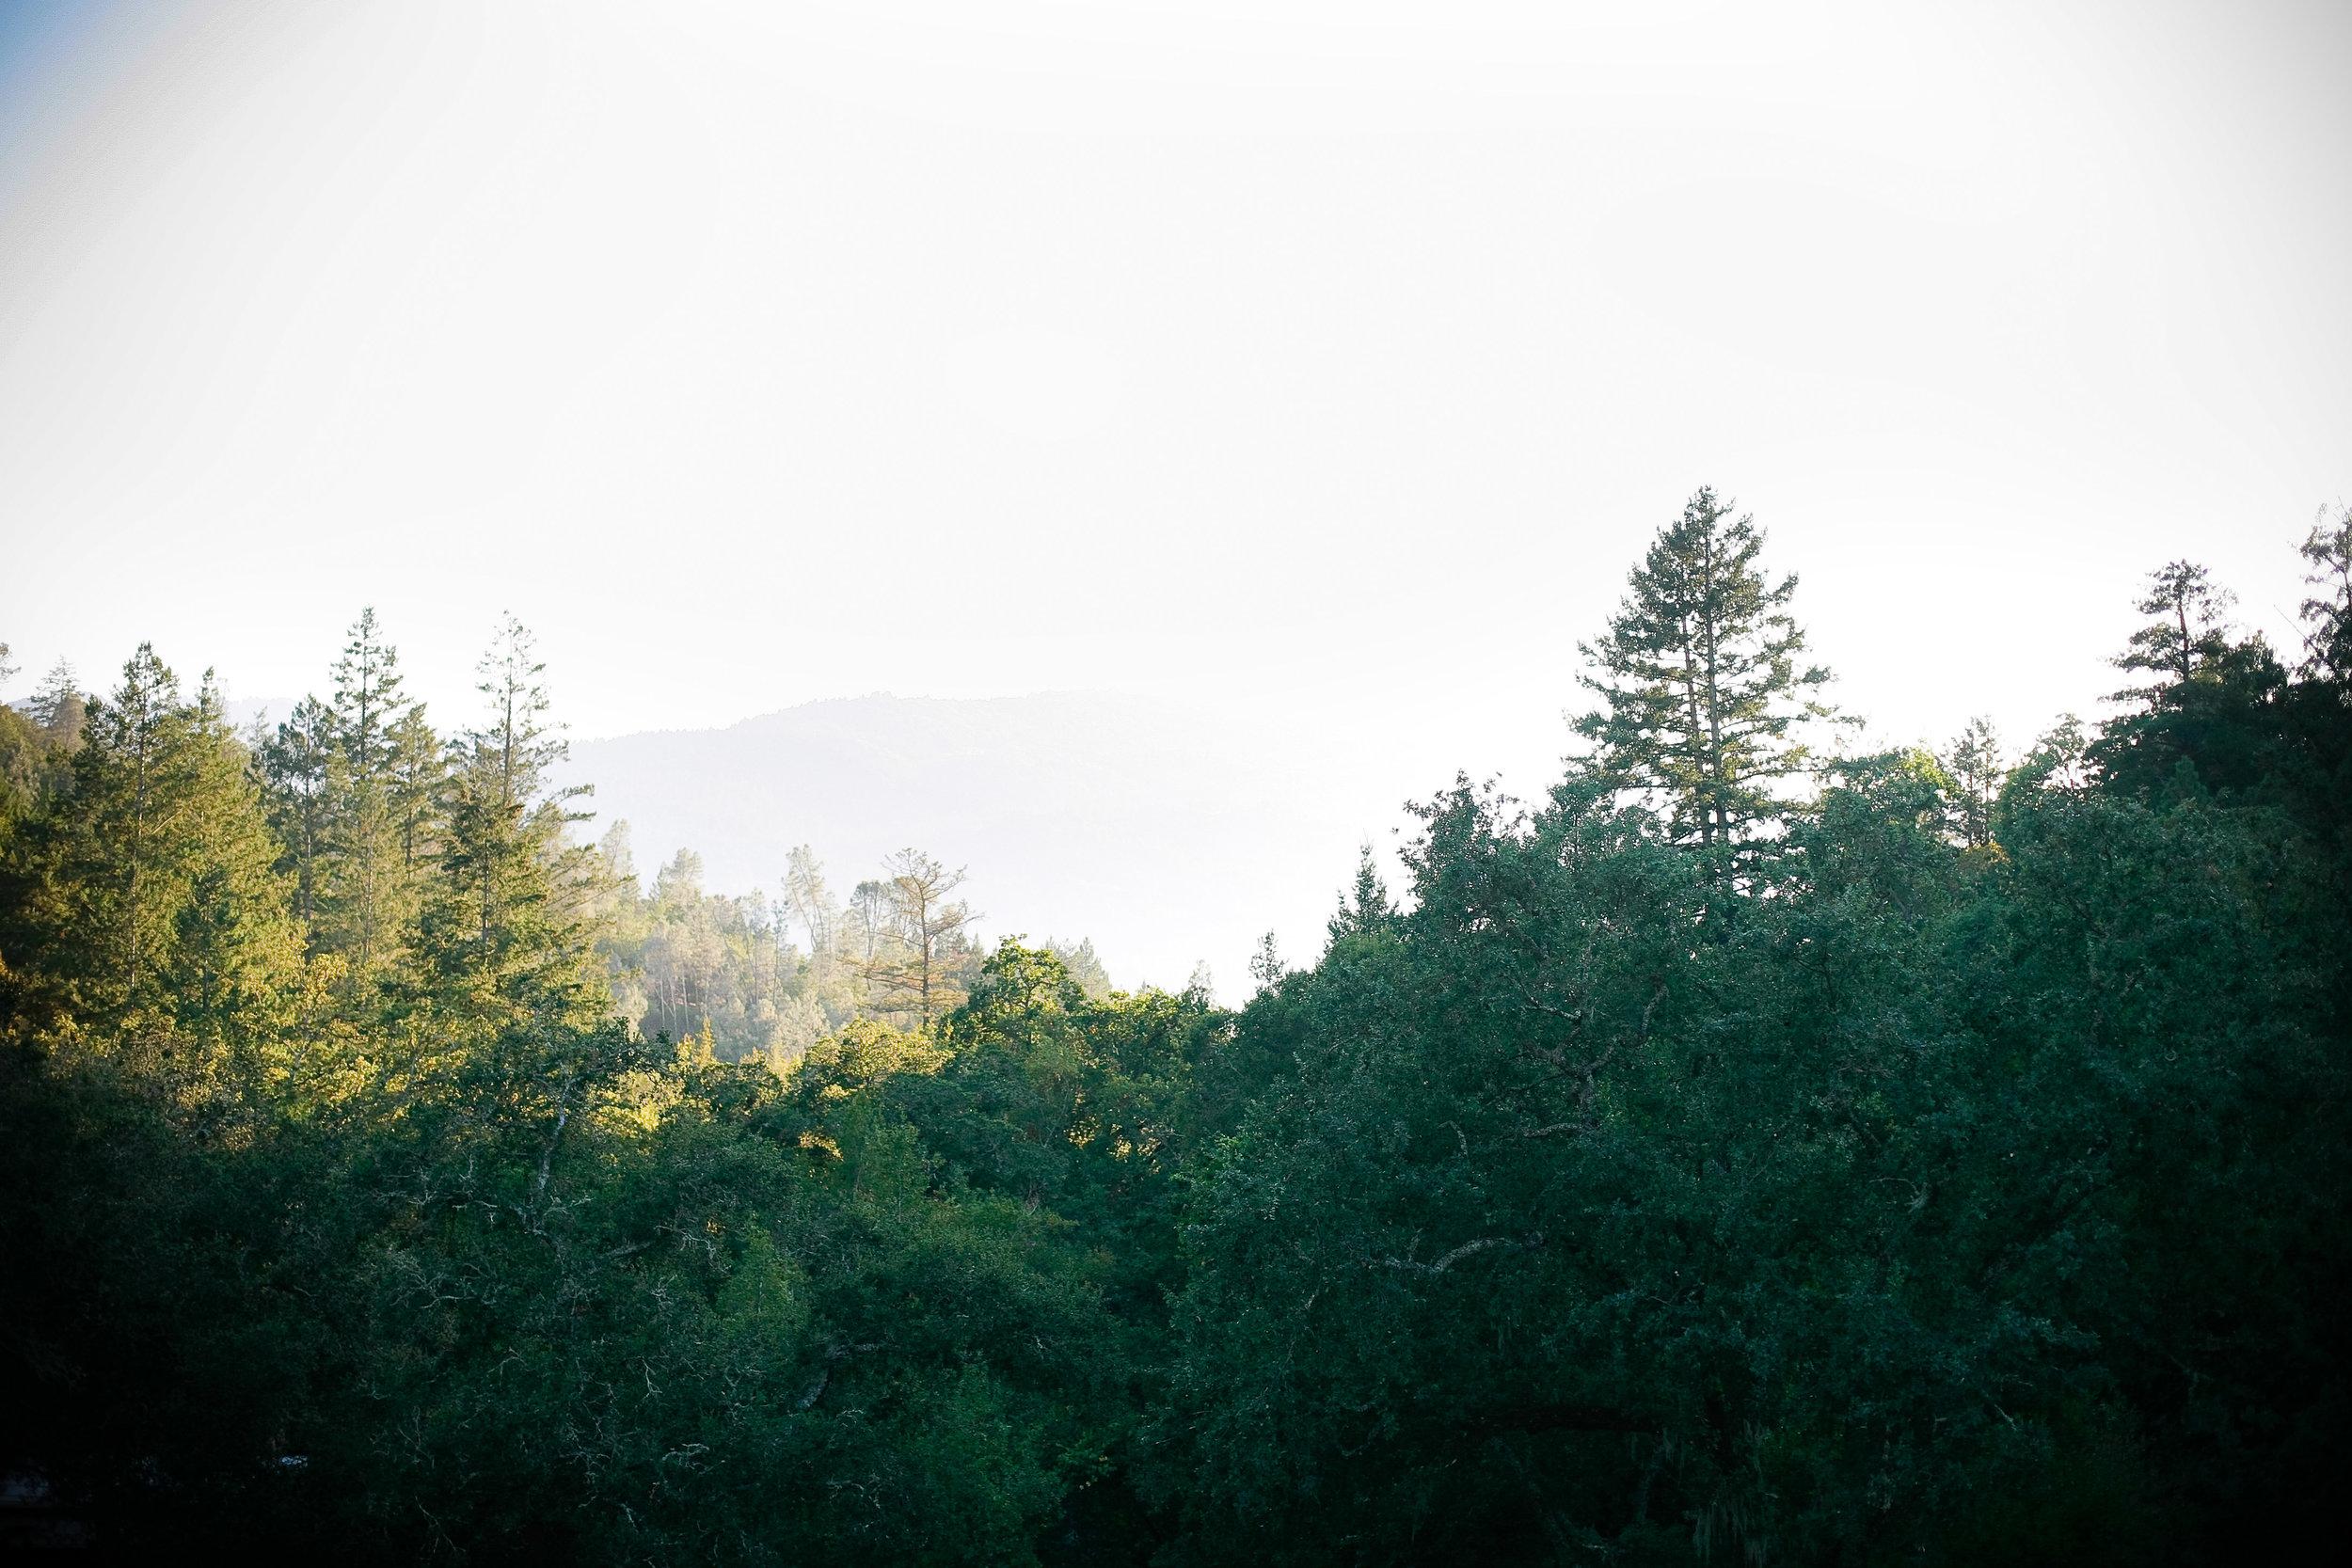 Best-Napa-Valley-Wedding-Venues-Calistoga-Ranch-(11).jpg